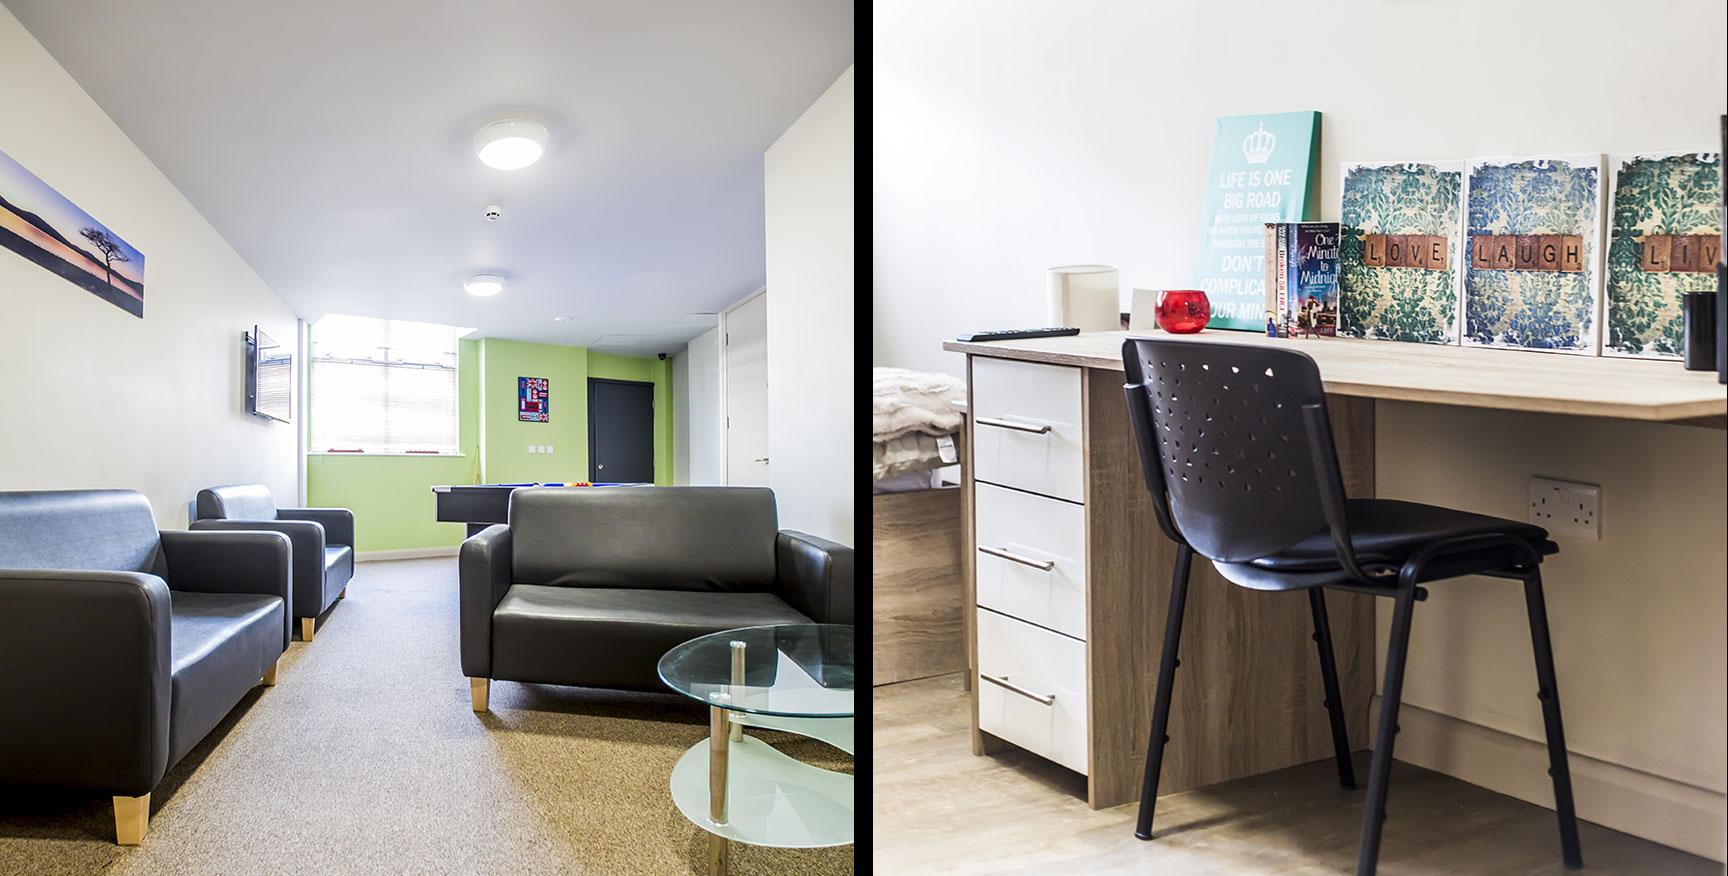 Alexandra House - Luxury Student Accommodation Sheffield (communal room and studio)